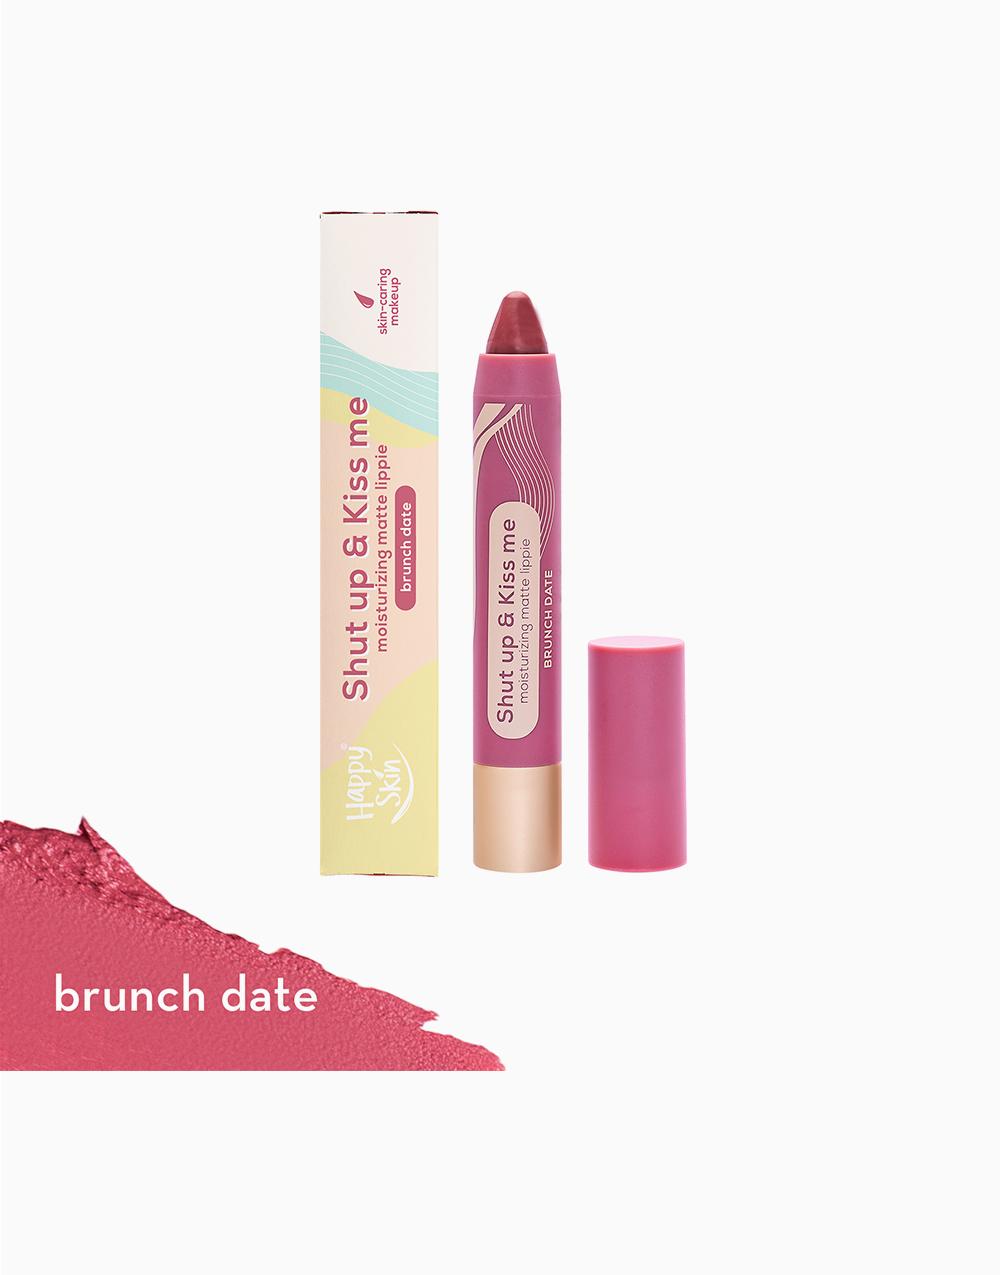 Shut Up & Kiss me Moisturizing Matte Lippie by Happy Skin   Brunch Date